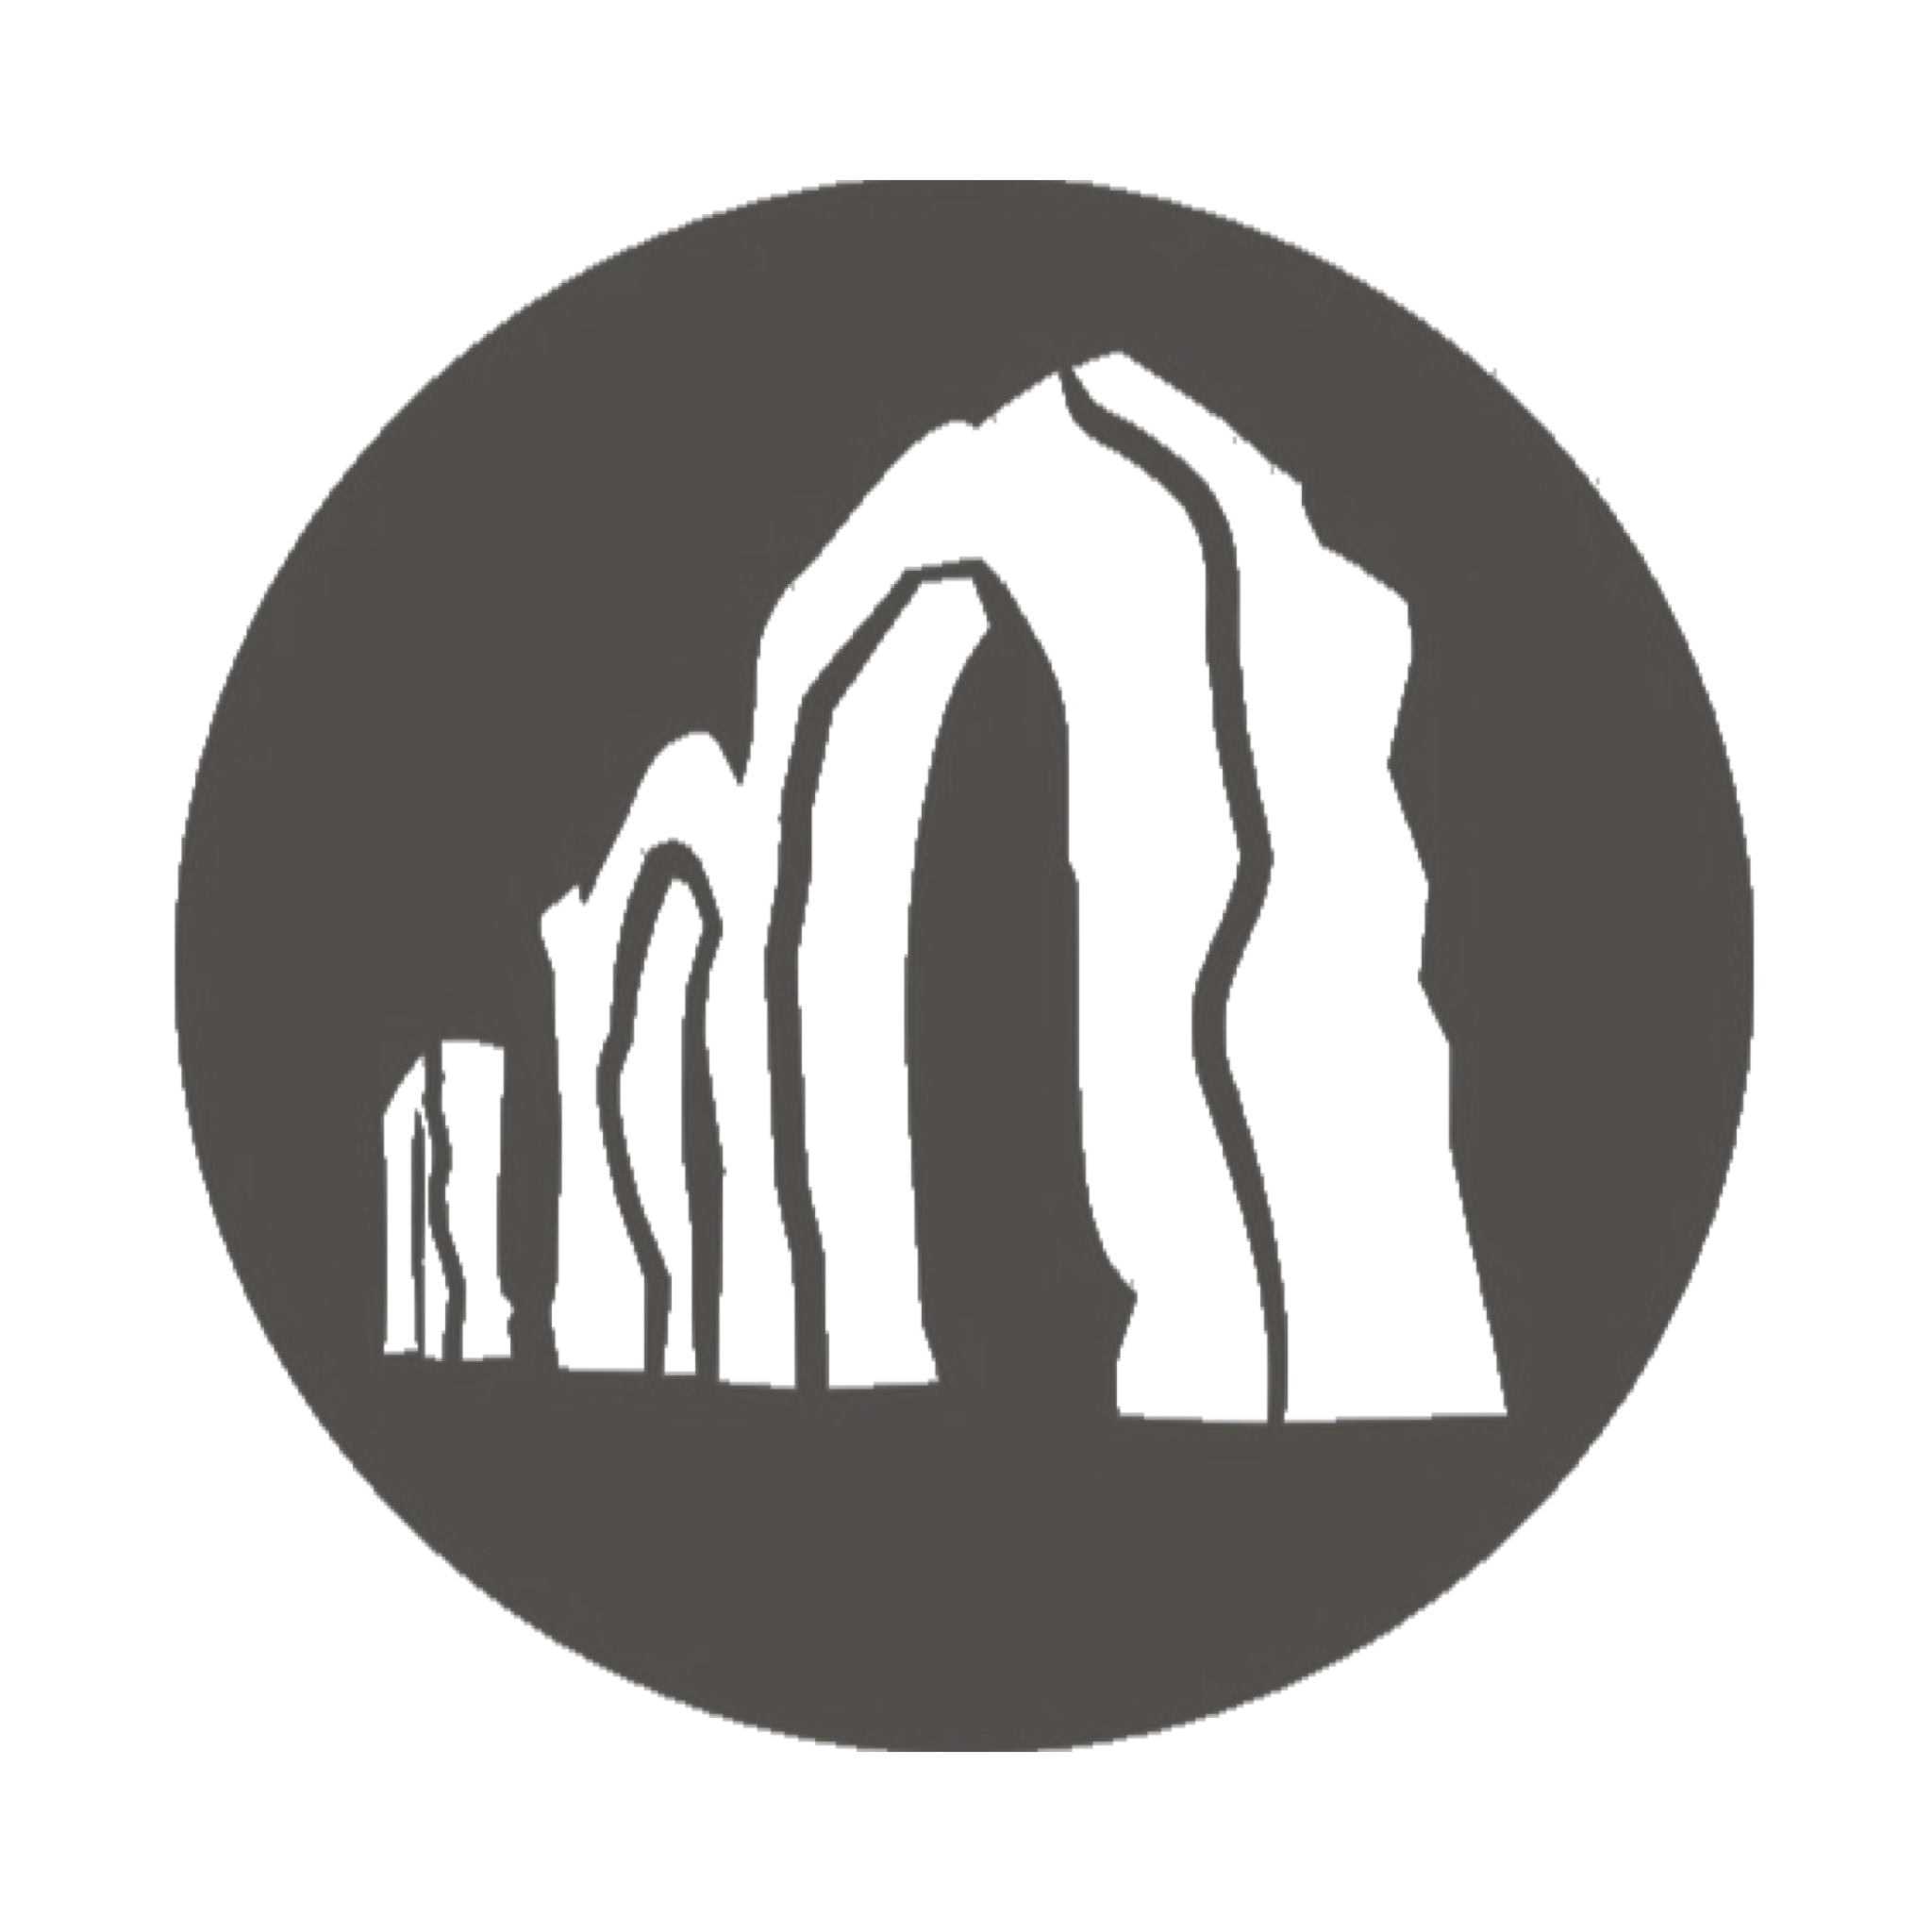 LOGO-DOMENYS-1x1-transp